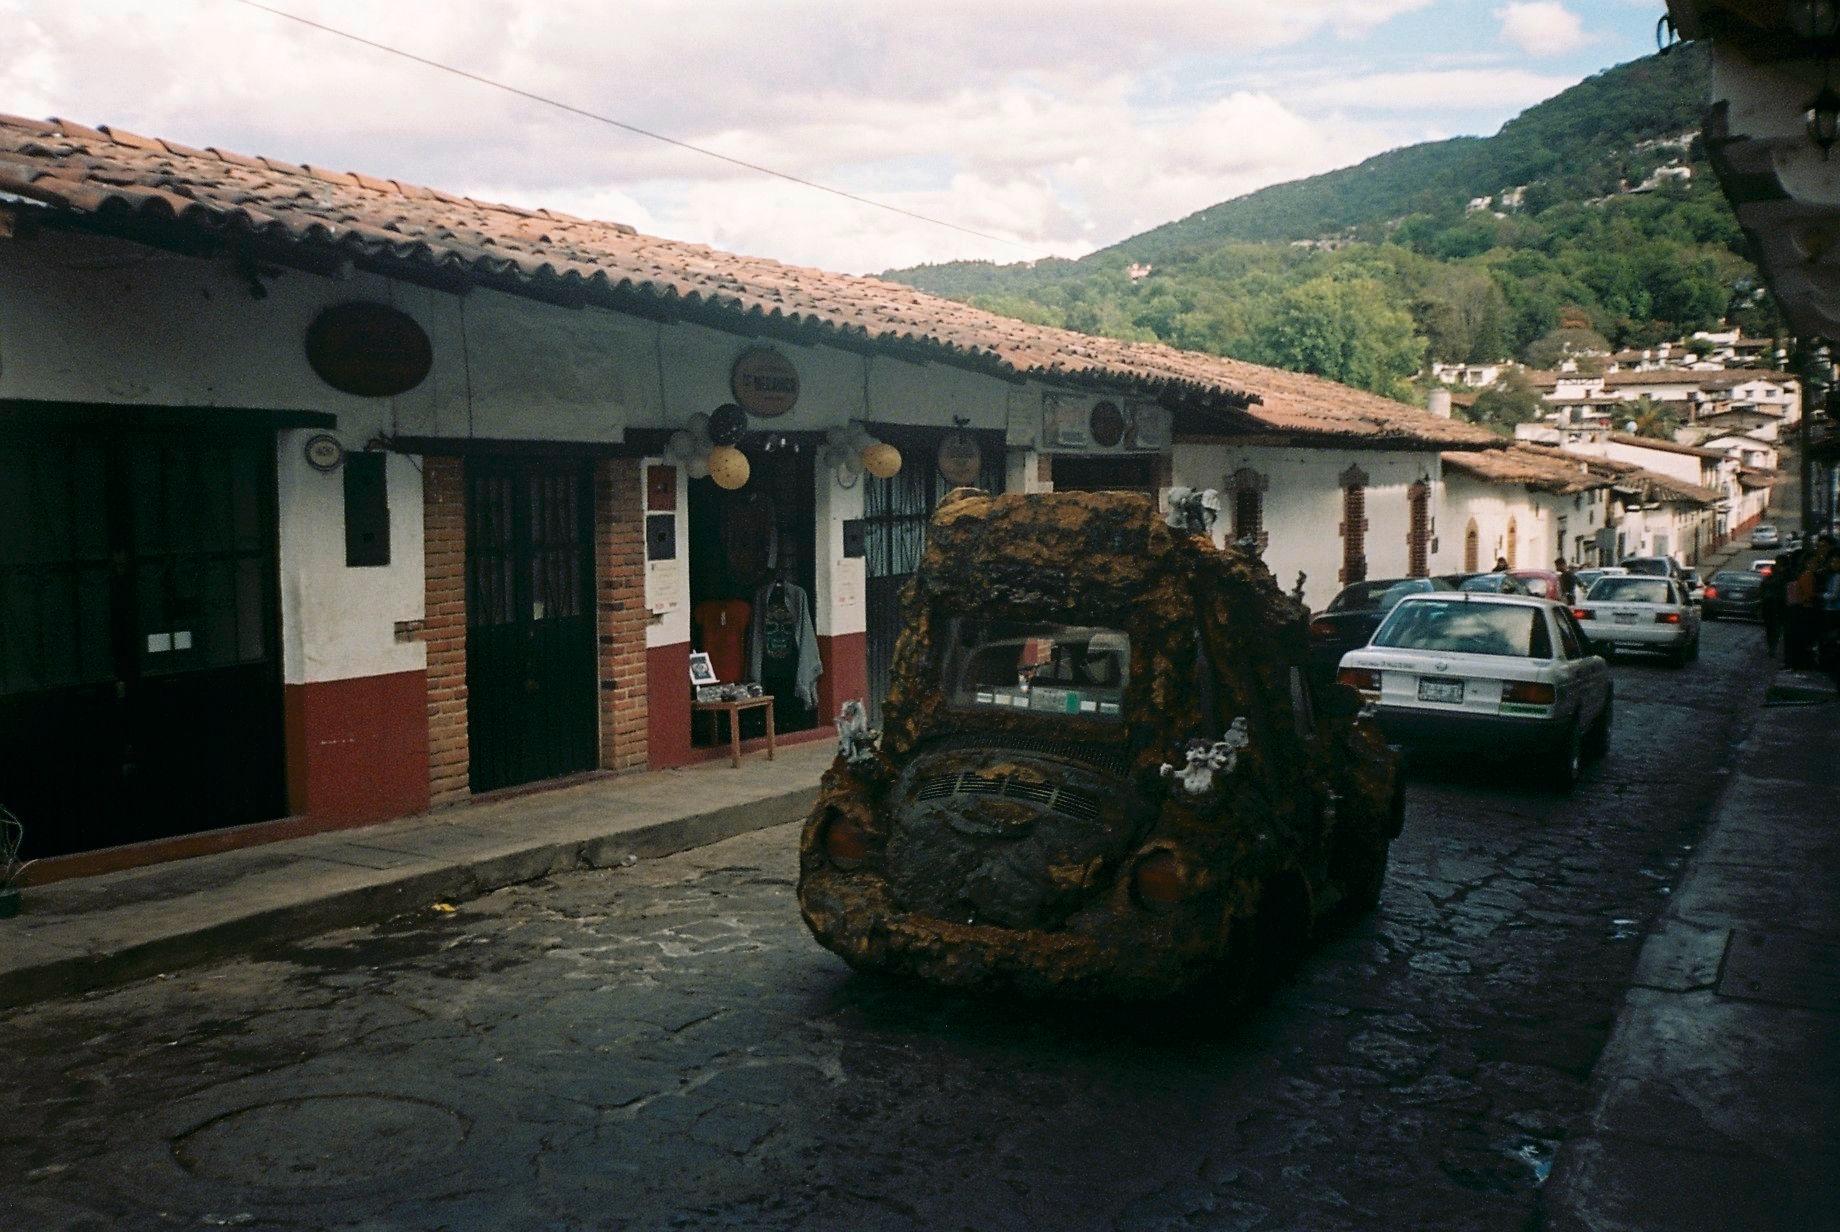 Valle De Bravo 01-2020 - 1 of 51